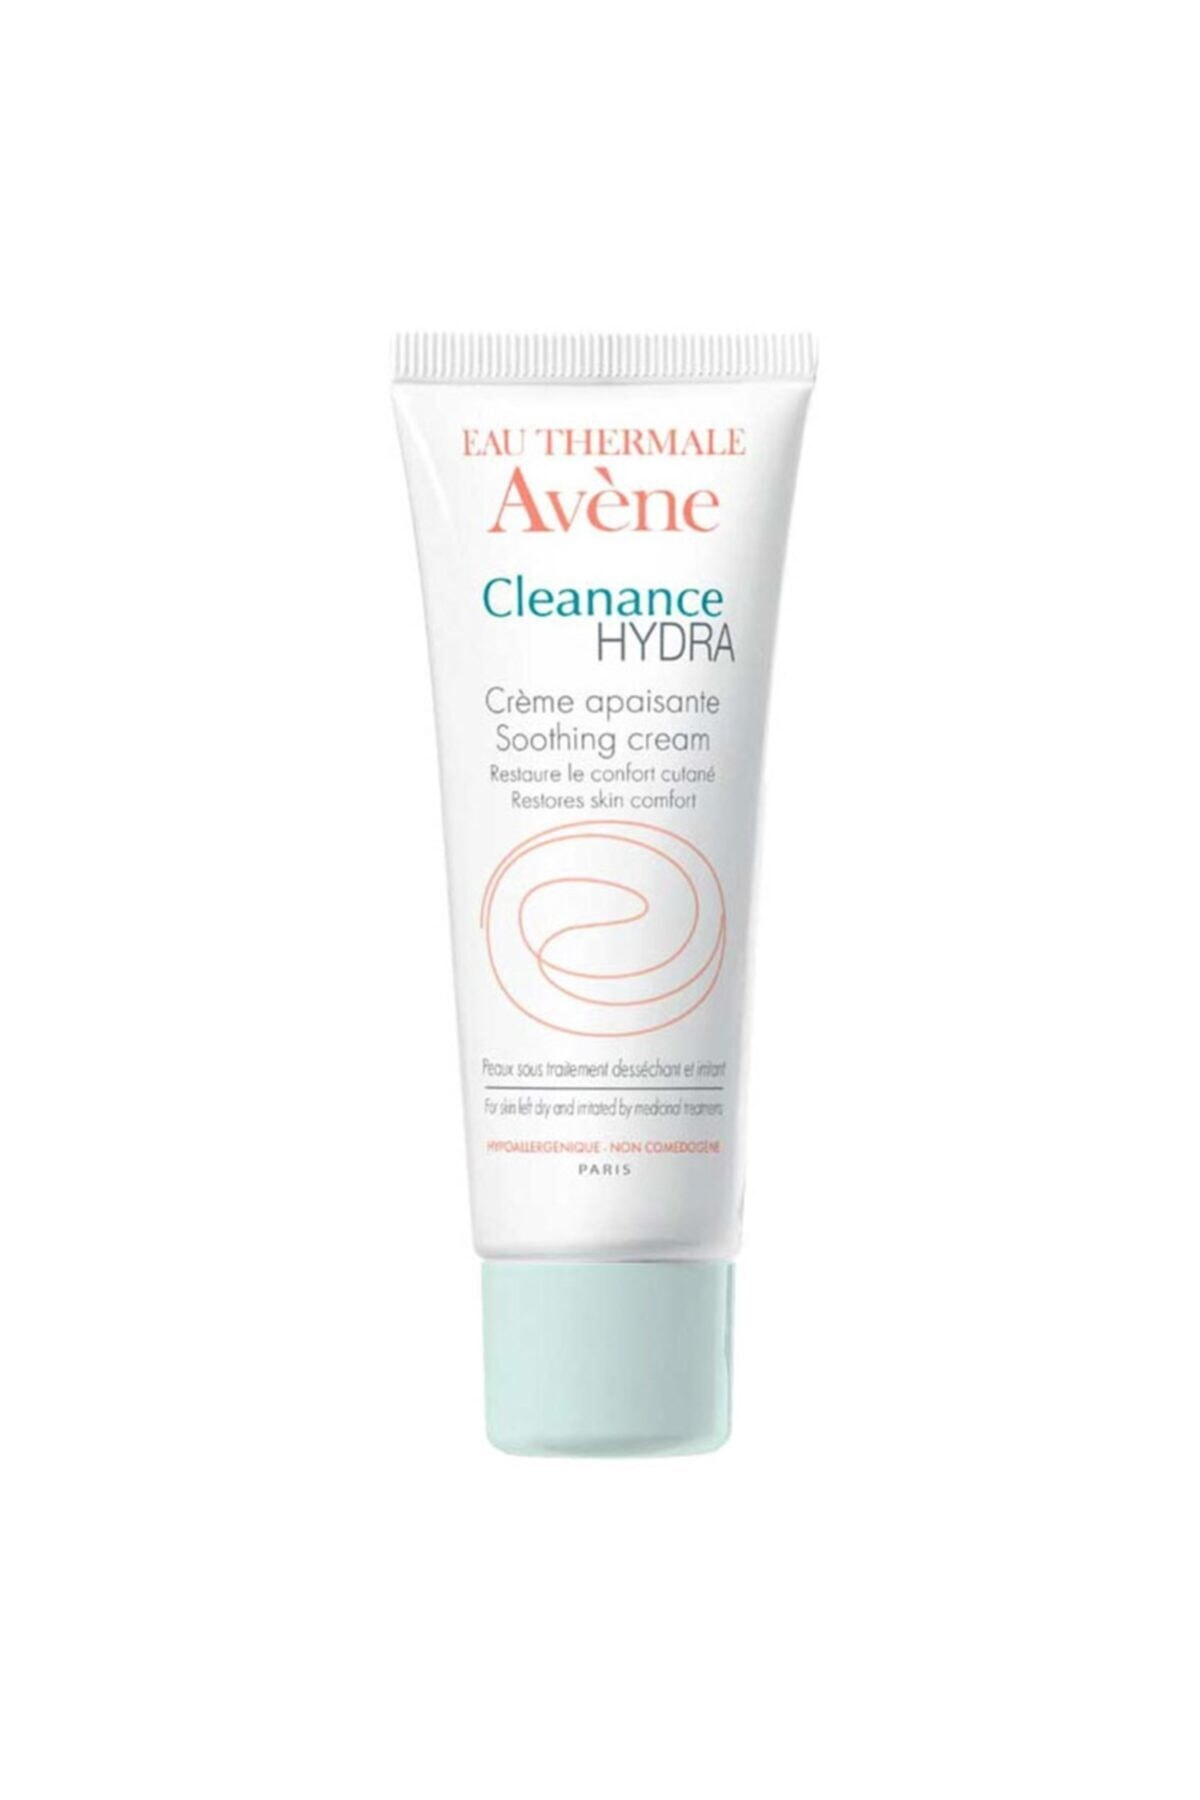 Avene Cleanance Hydra Creme Apaisante 40 Ml 1